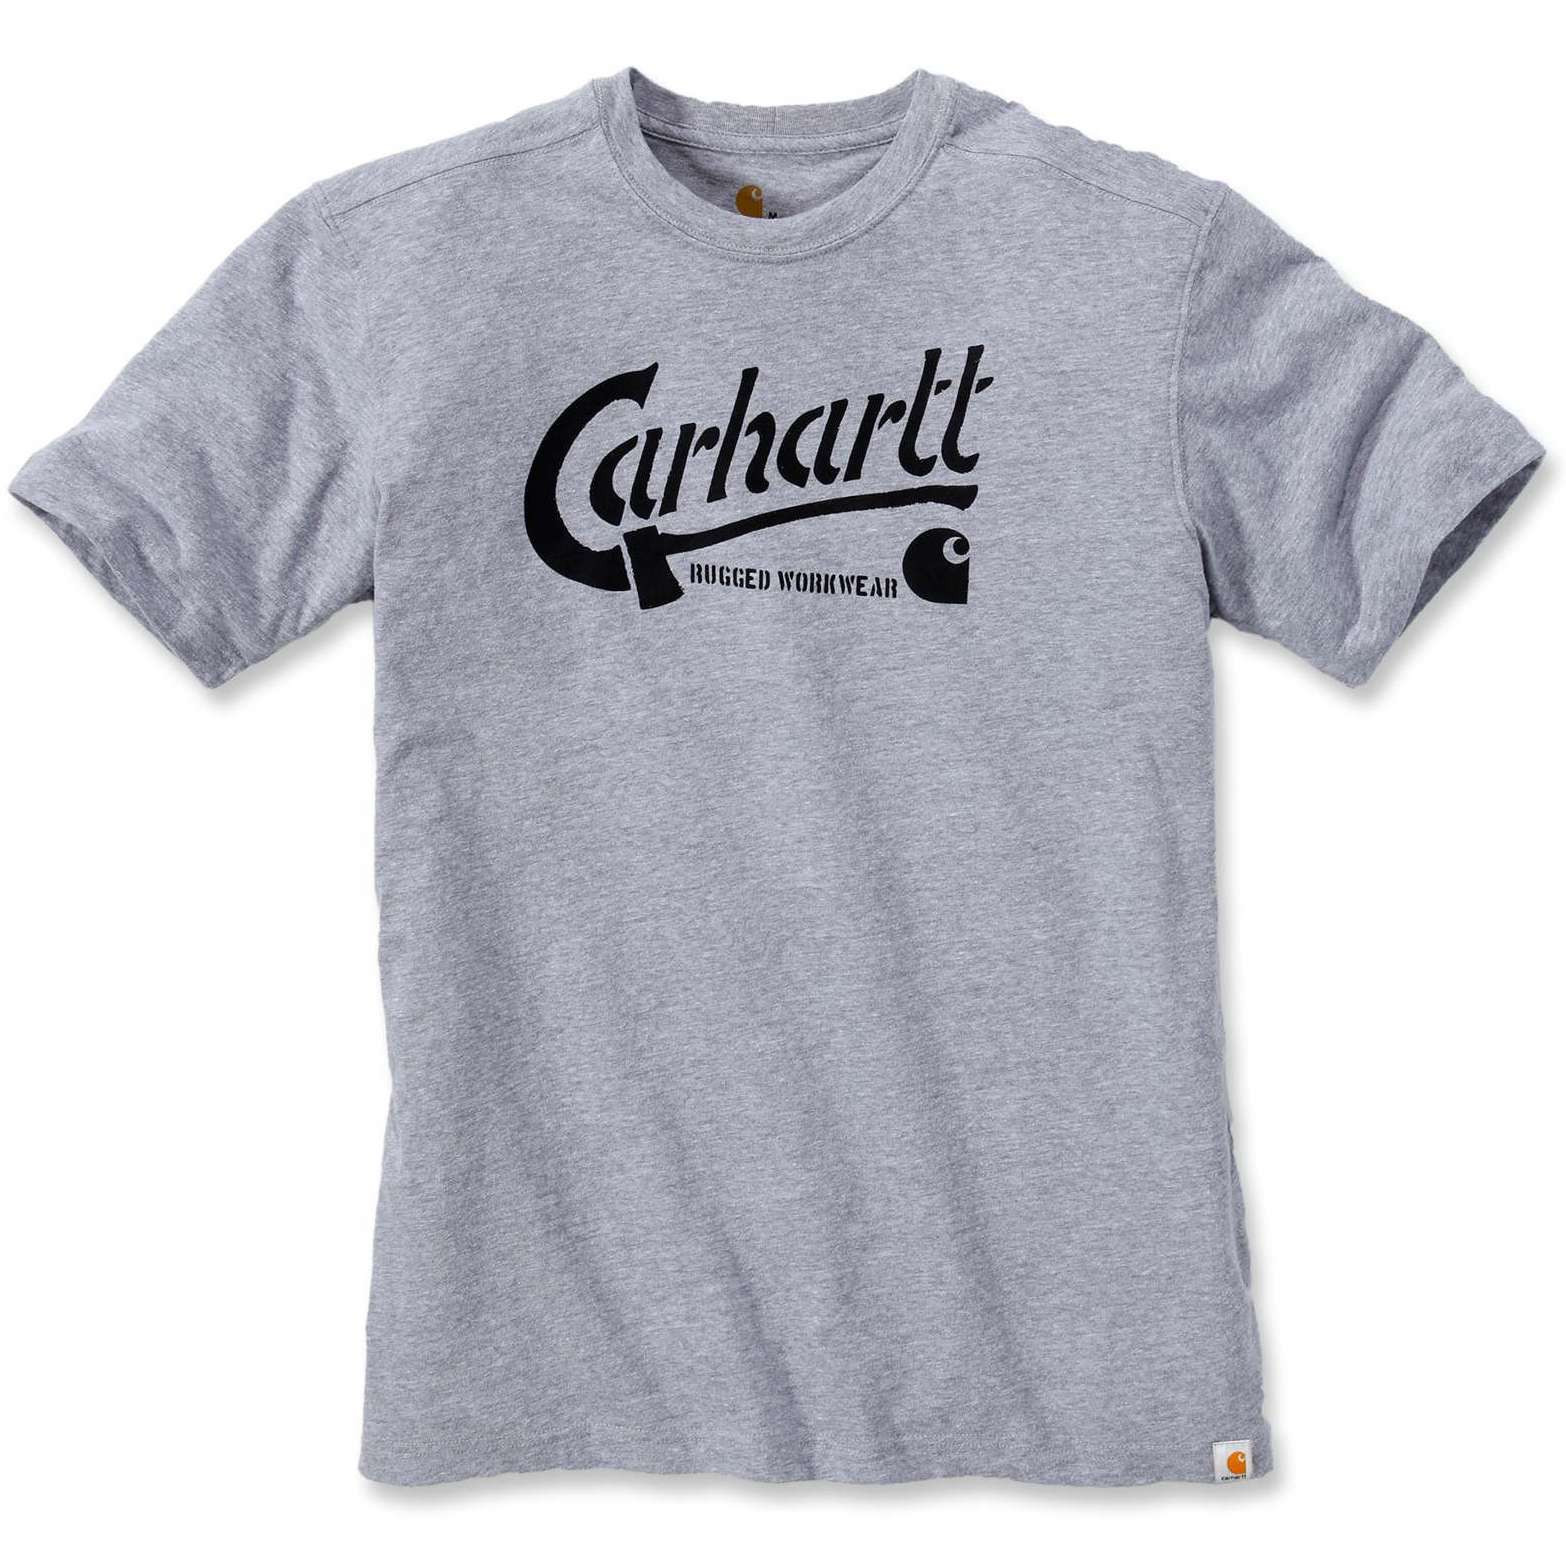 Футболка Carhartt AX Graphic T-Shirt S/S - 103183 (Heather Grey; M)